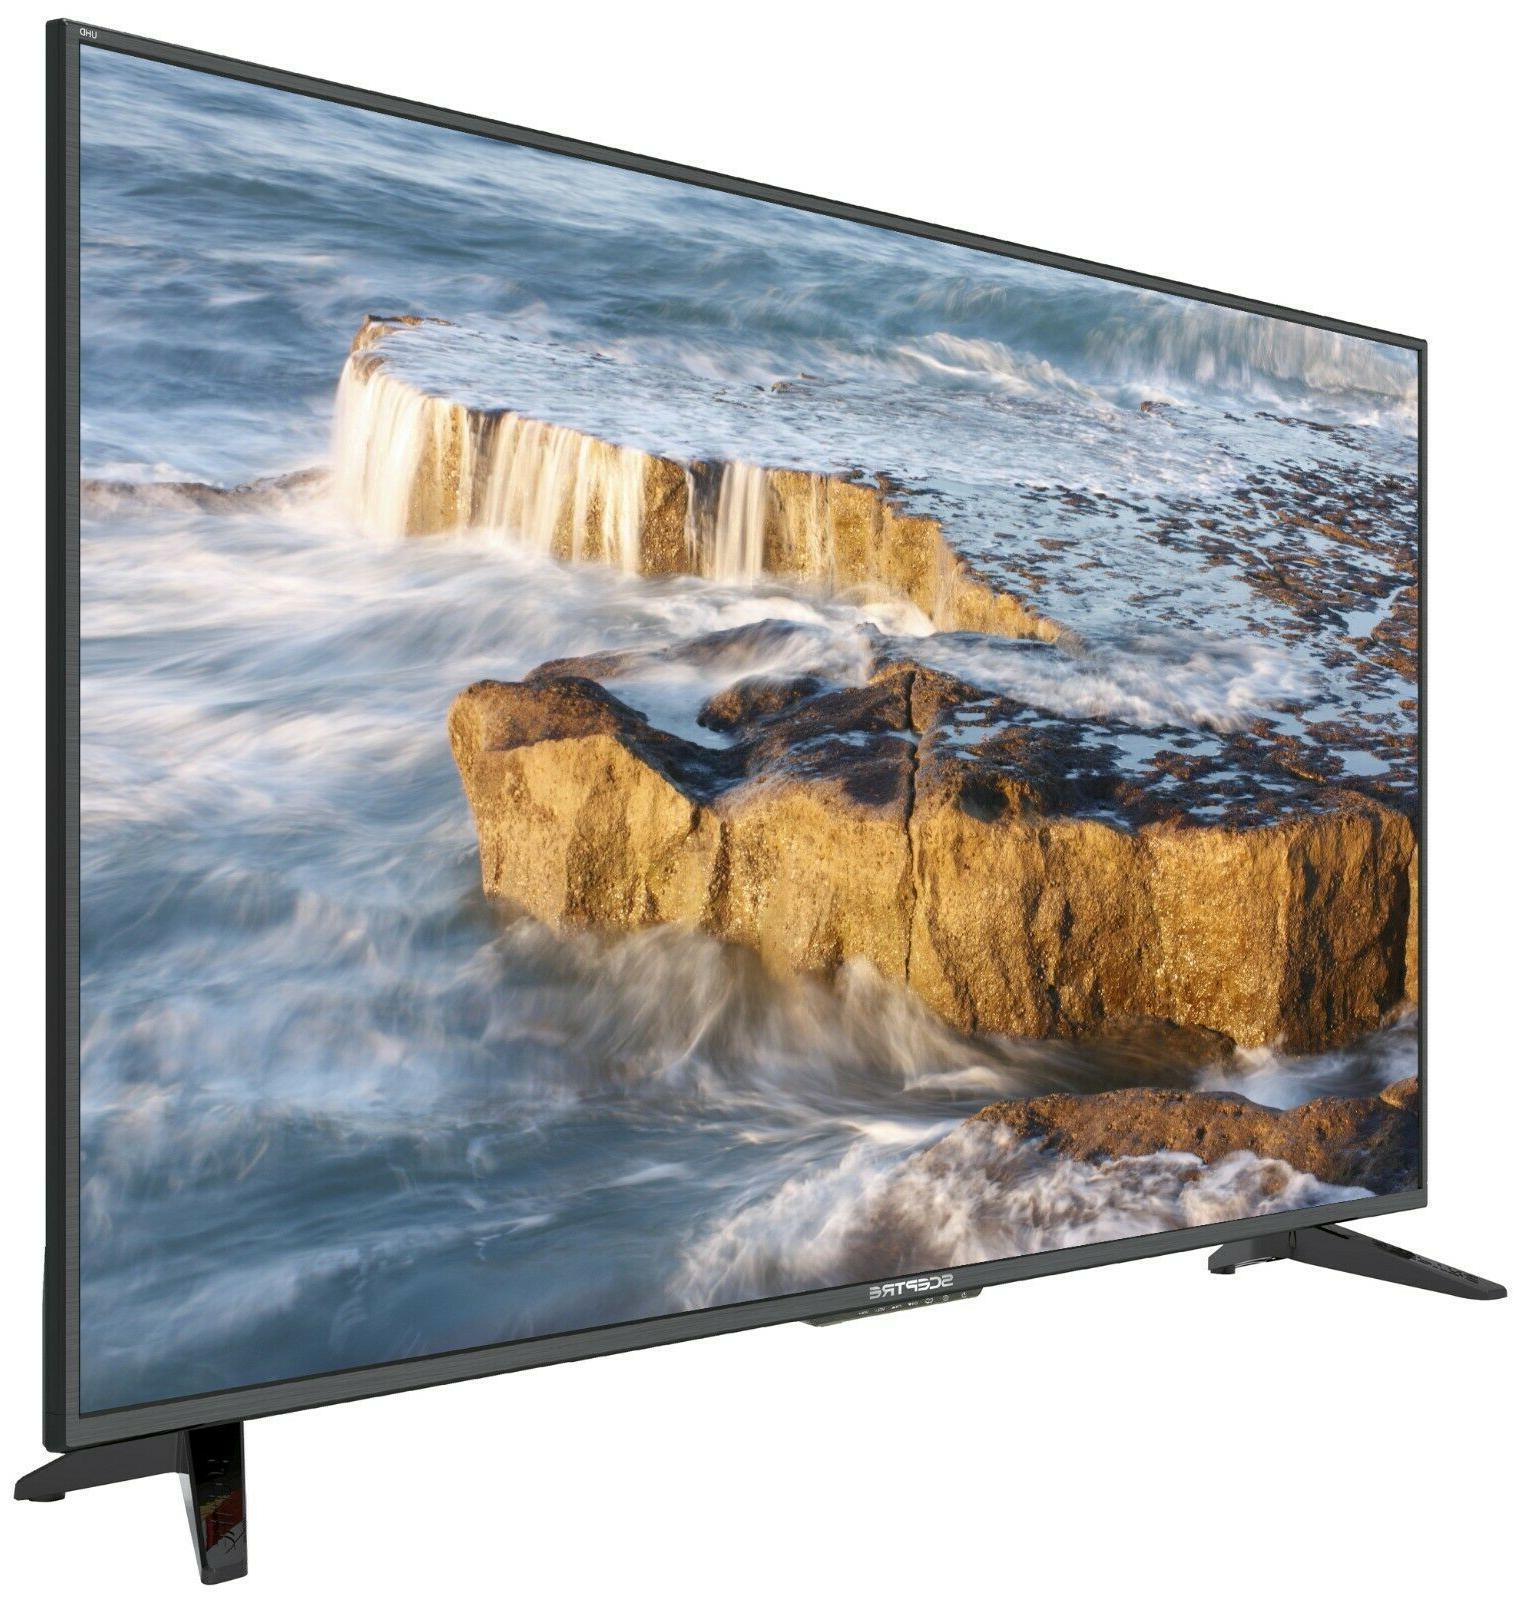 Brand Class UHD TV HDR